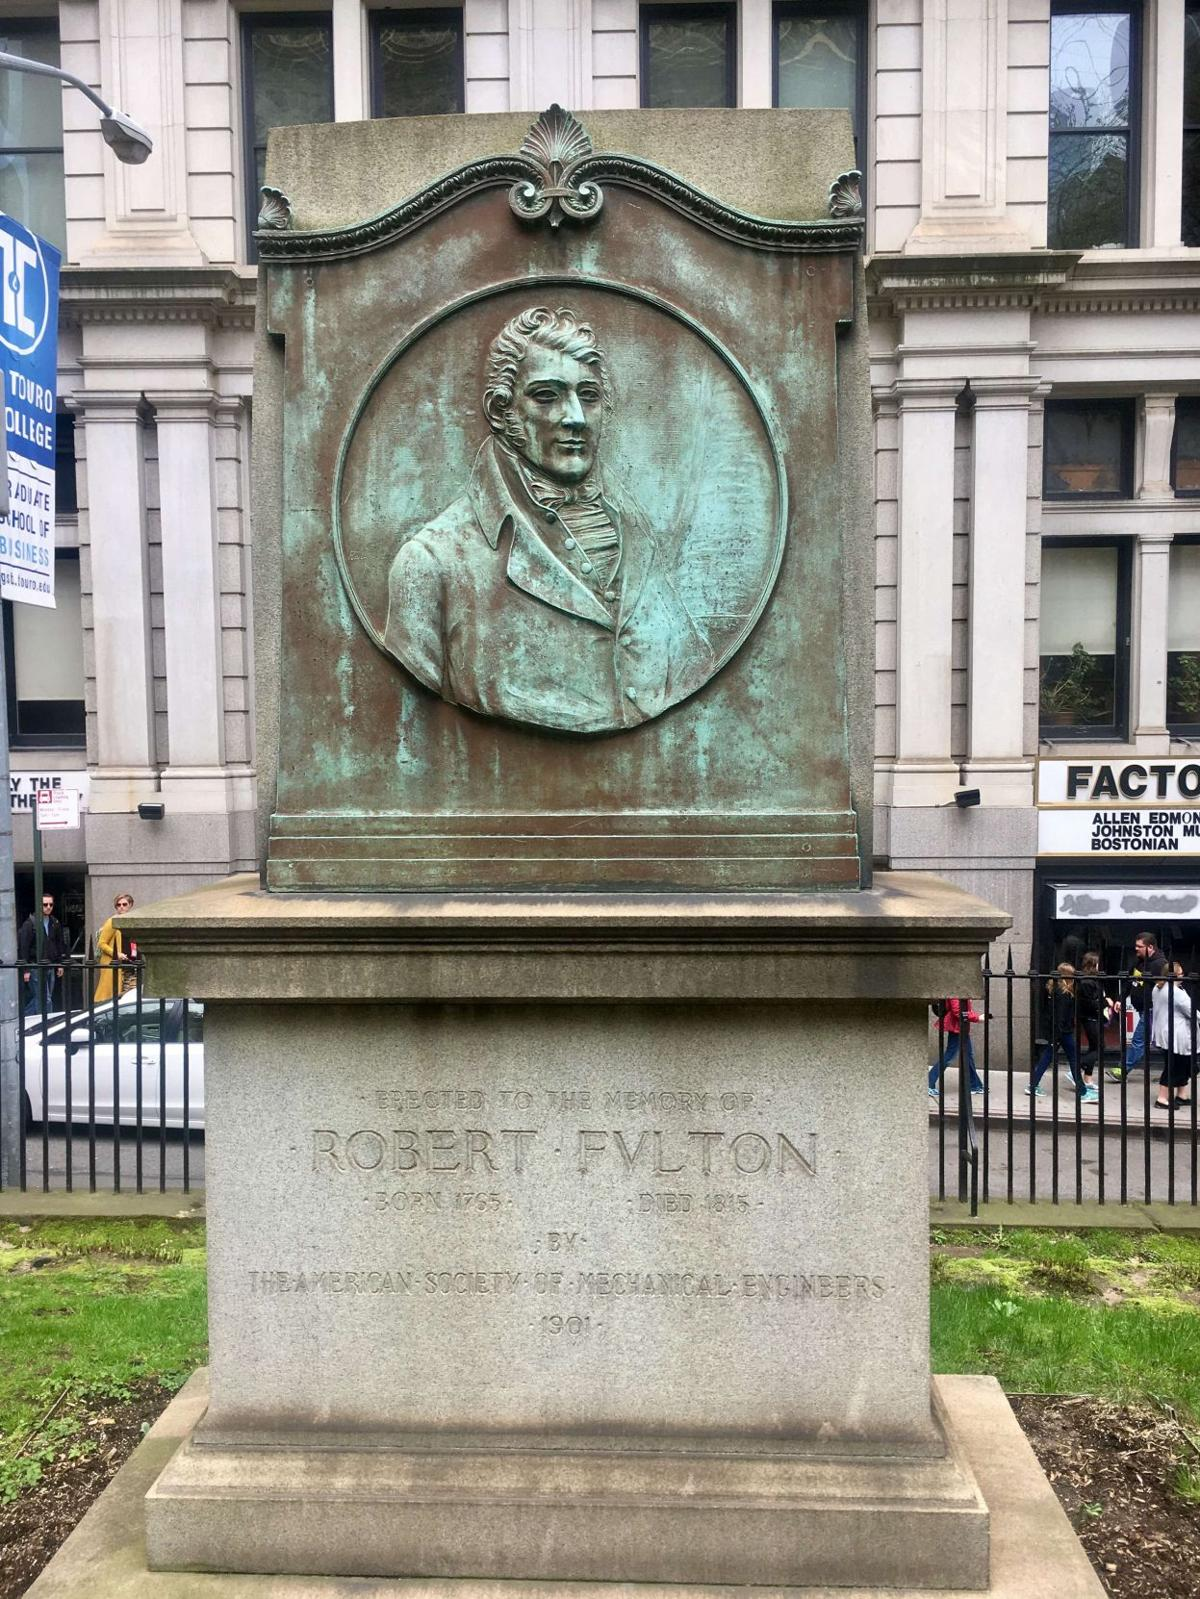 Robert Fulton grave